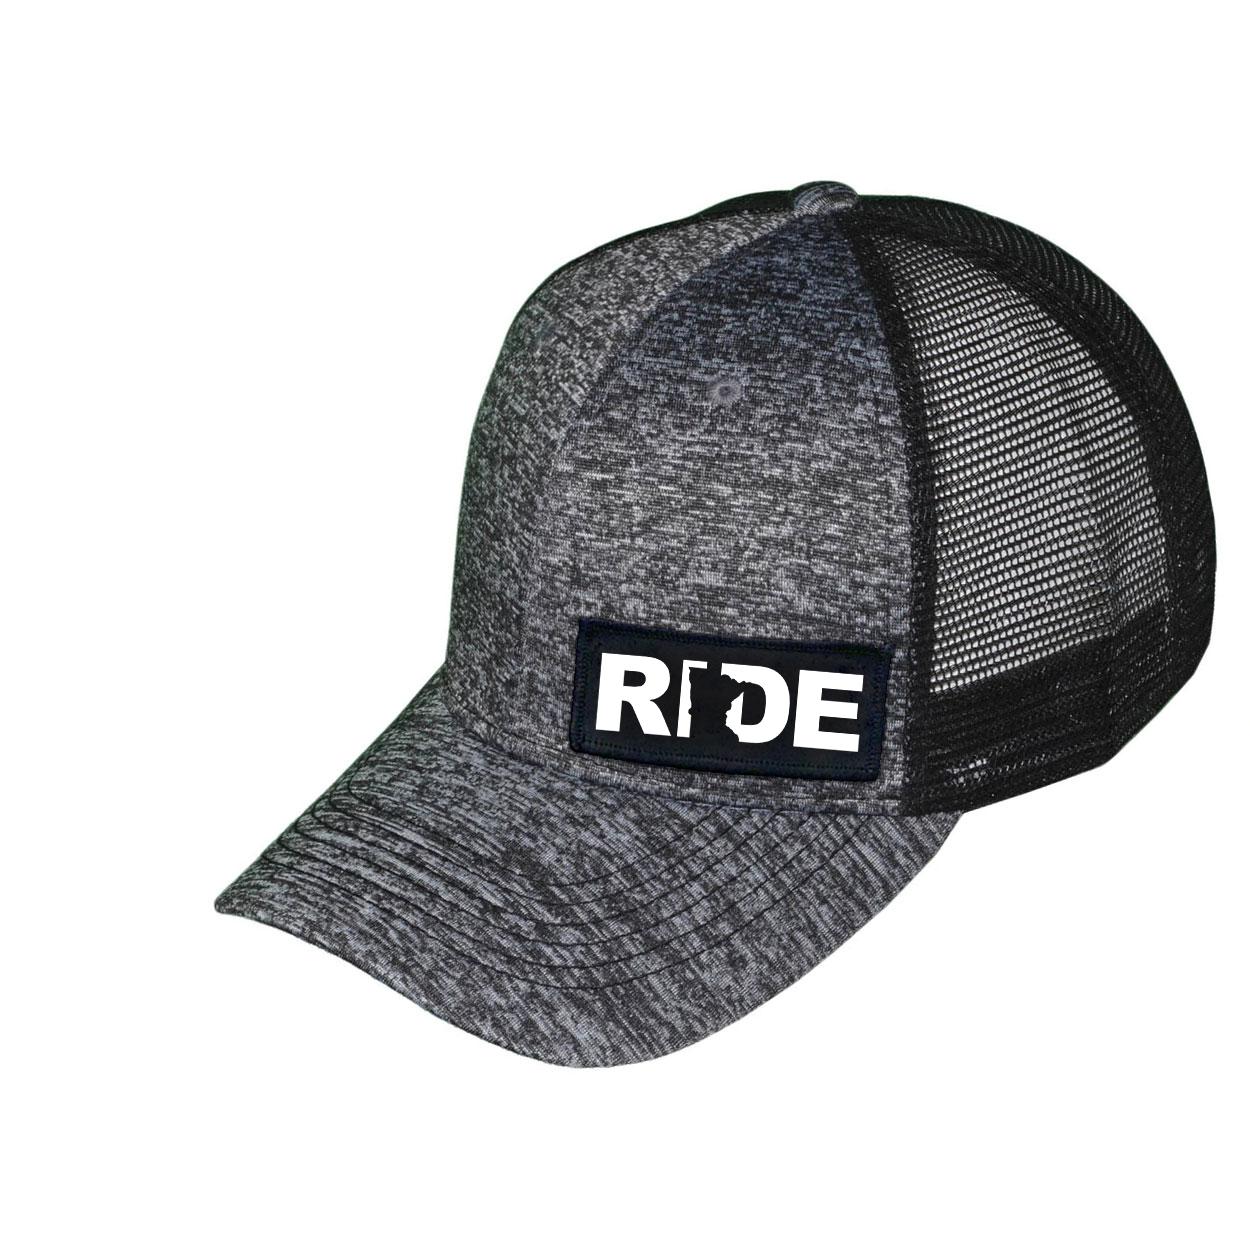 Ride Minnesota Night Out Woven Patch Melange Snapback Trucker Hat Gray/Black (White Logo)